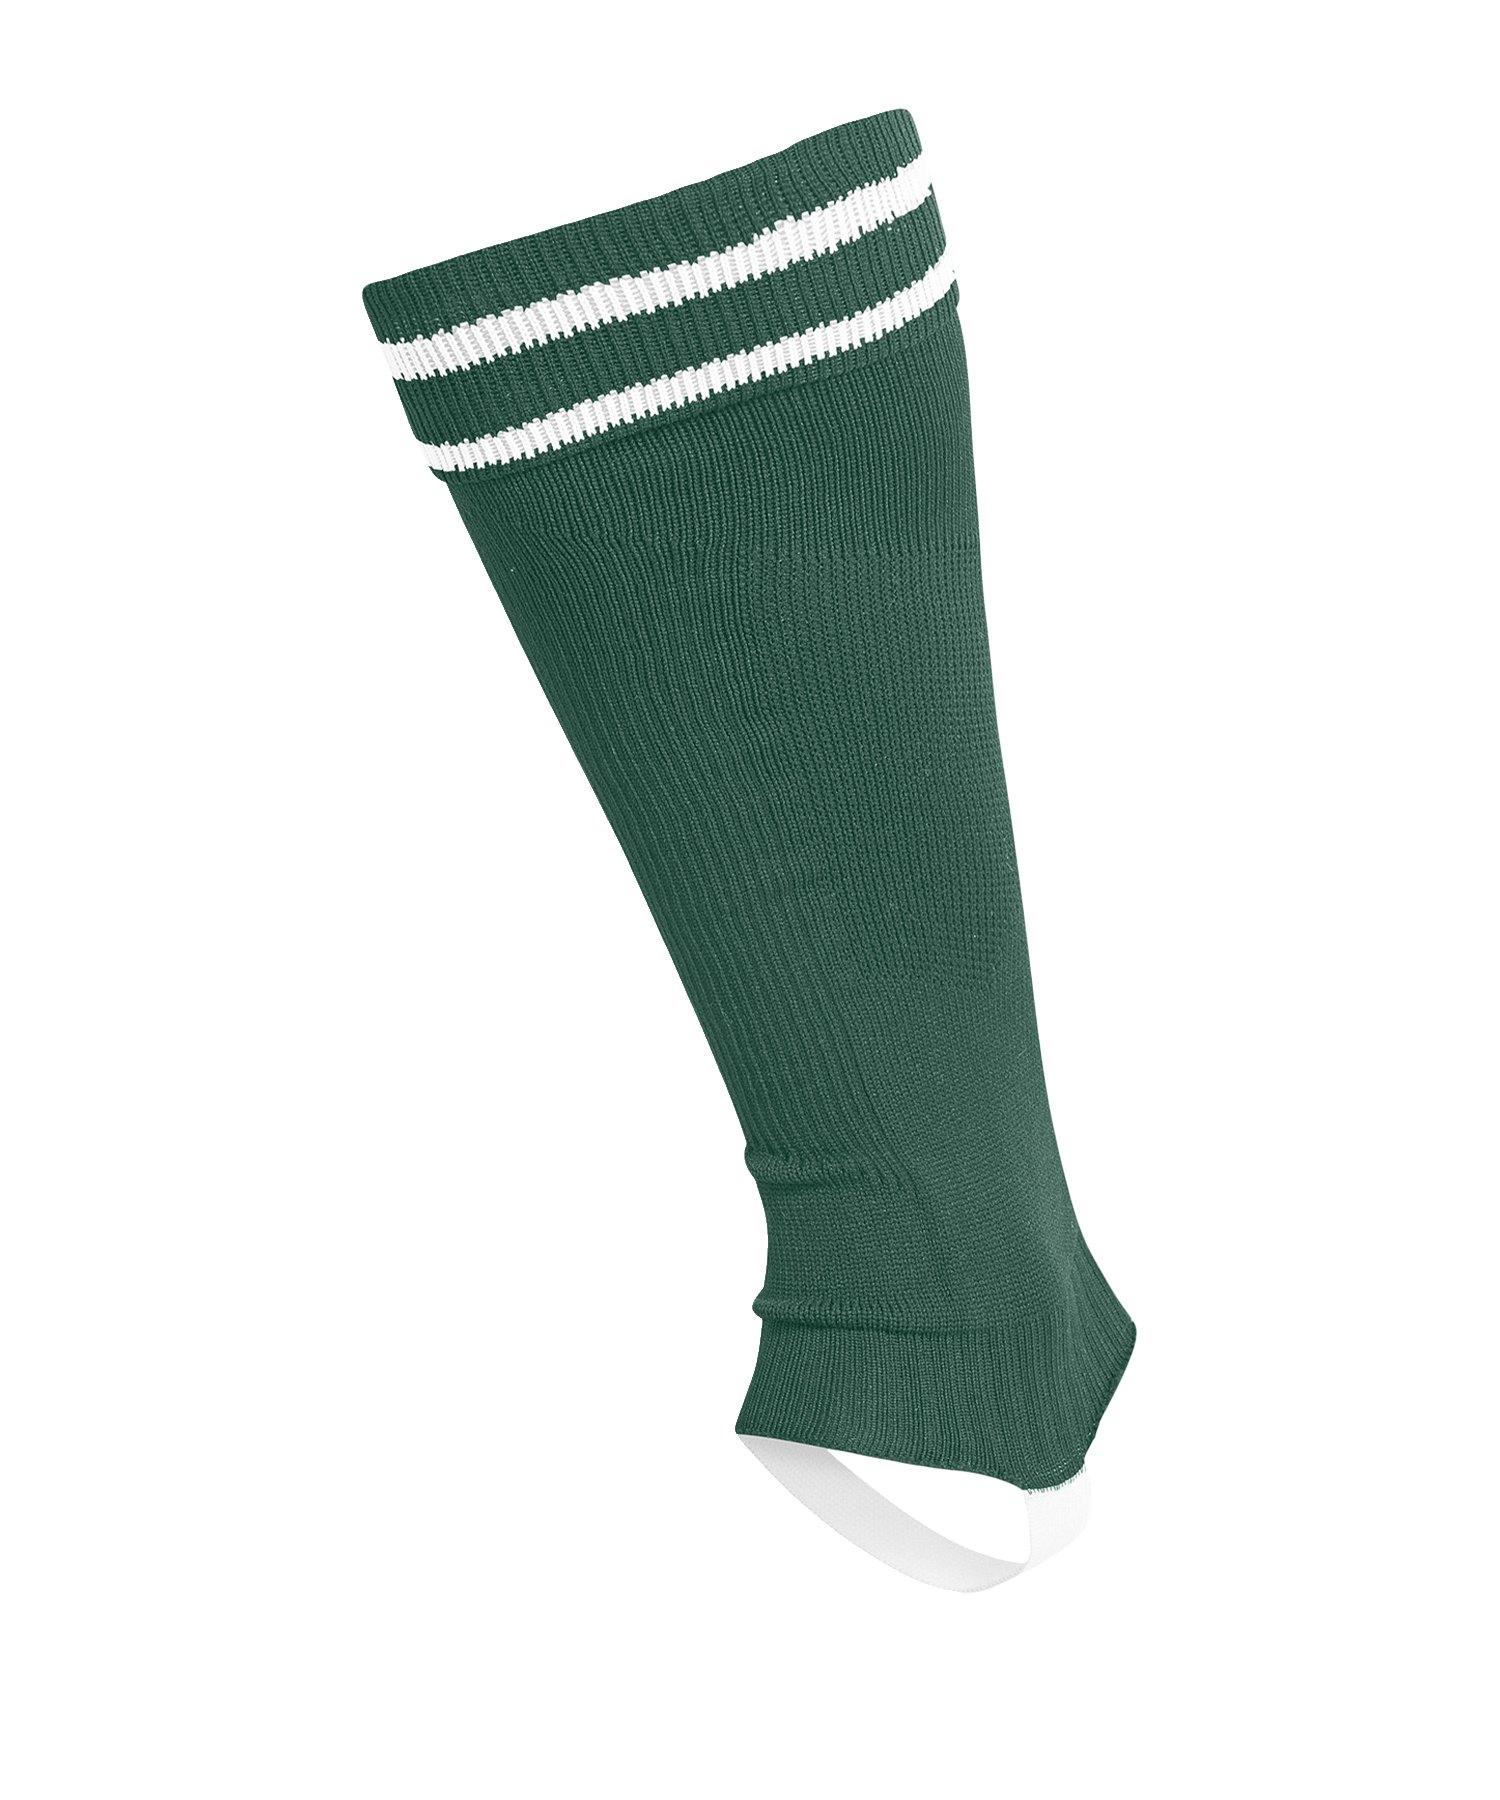 Hummel Element Football Sock Stegstutzen F6131 - Gruen